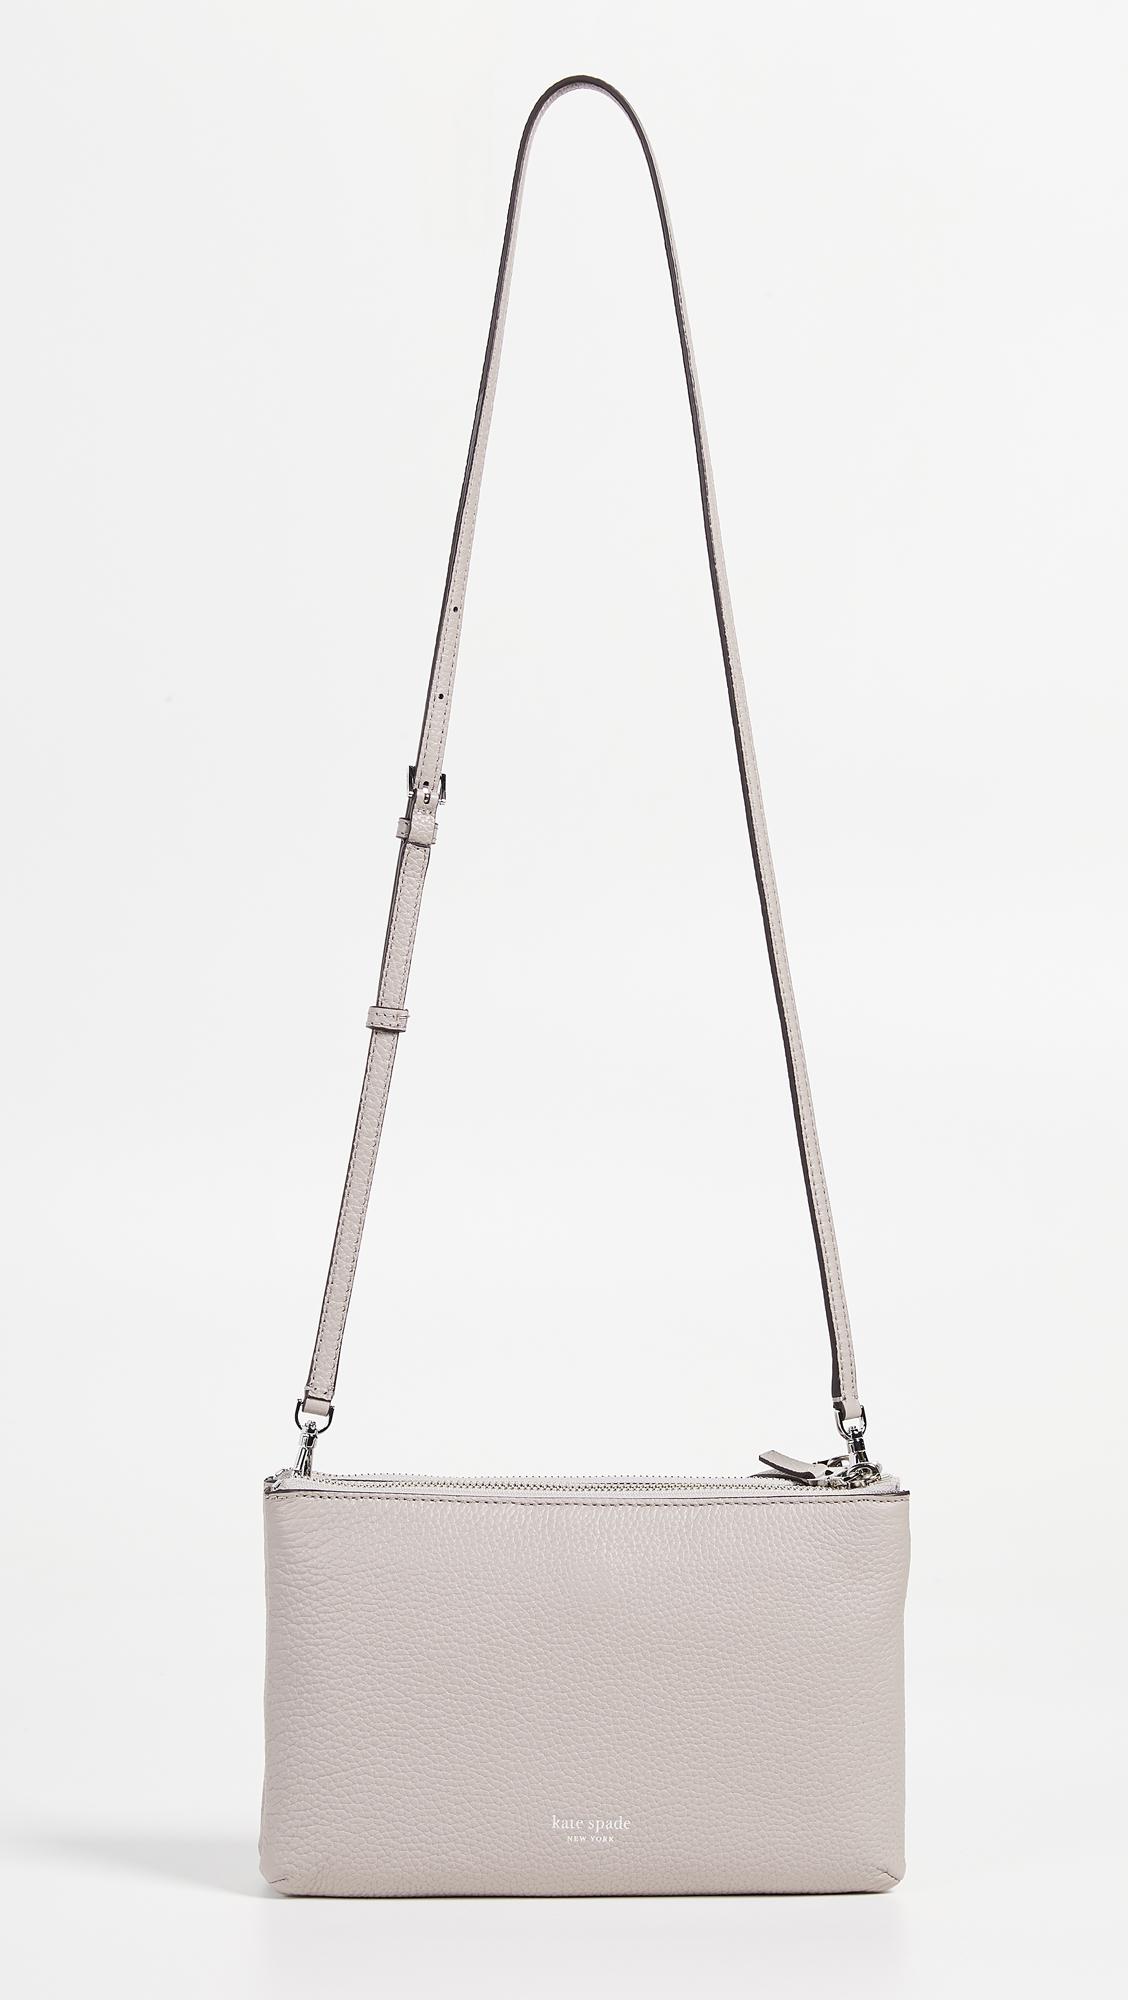 dd7c35cacfe Kate Spade New York Polly Medium Double Gusset Crossbody Bag   SHOPBOP